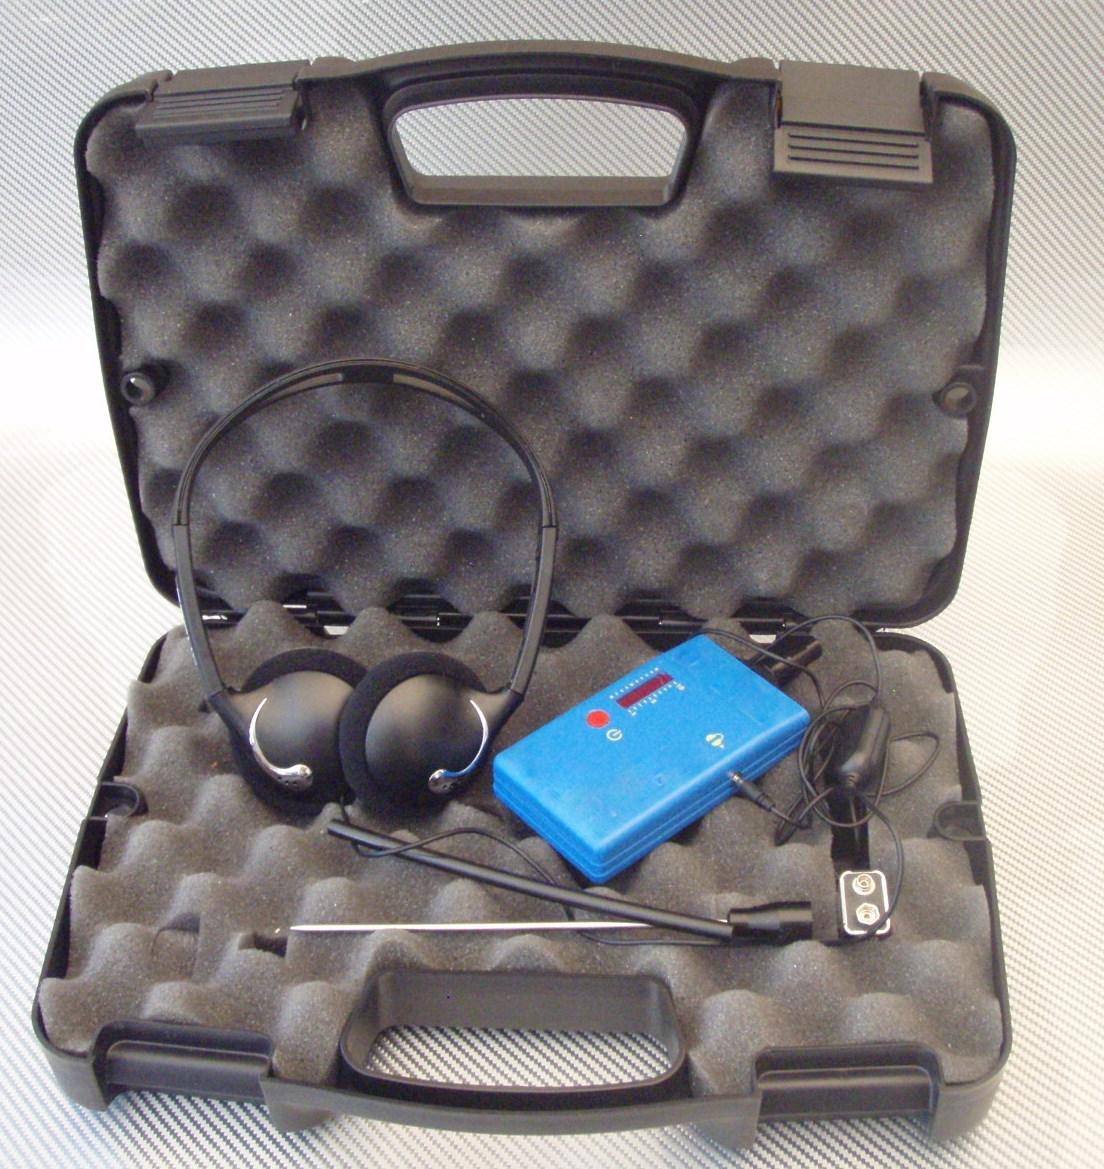 Ultrasonic leak detector <br>